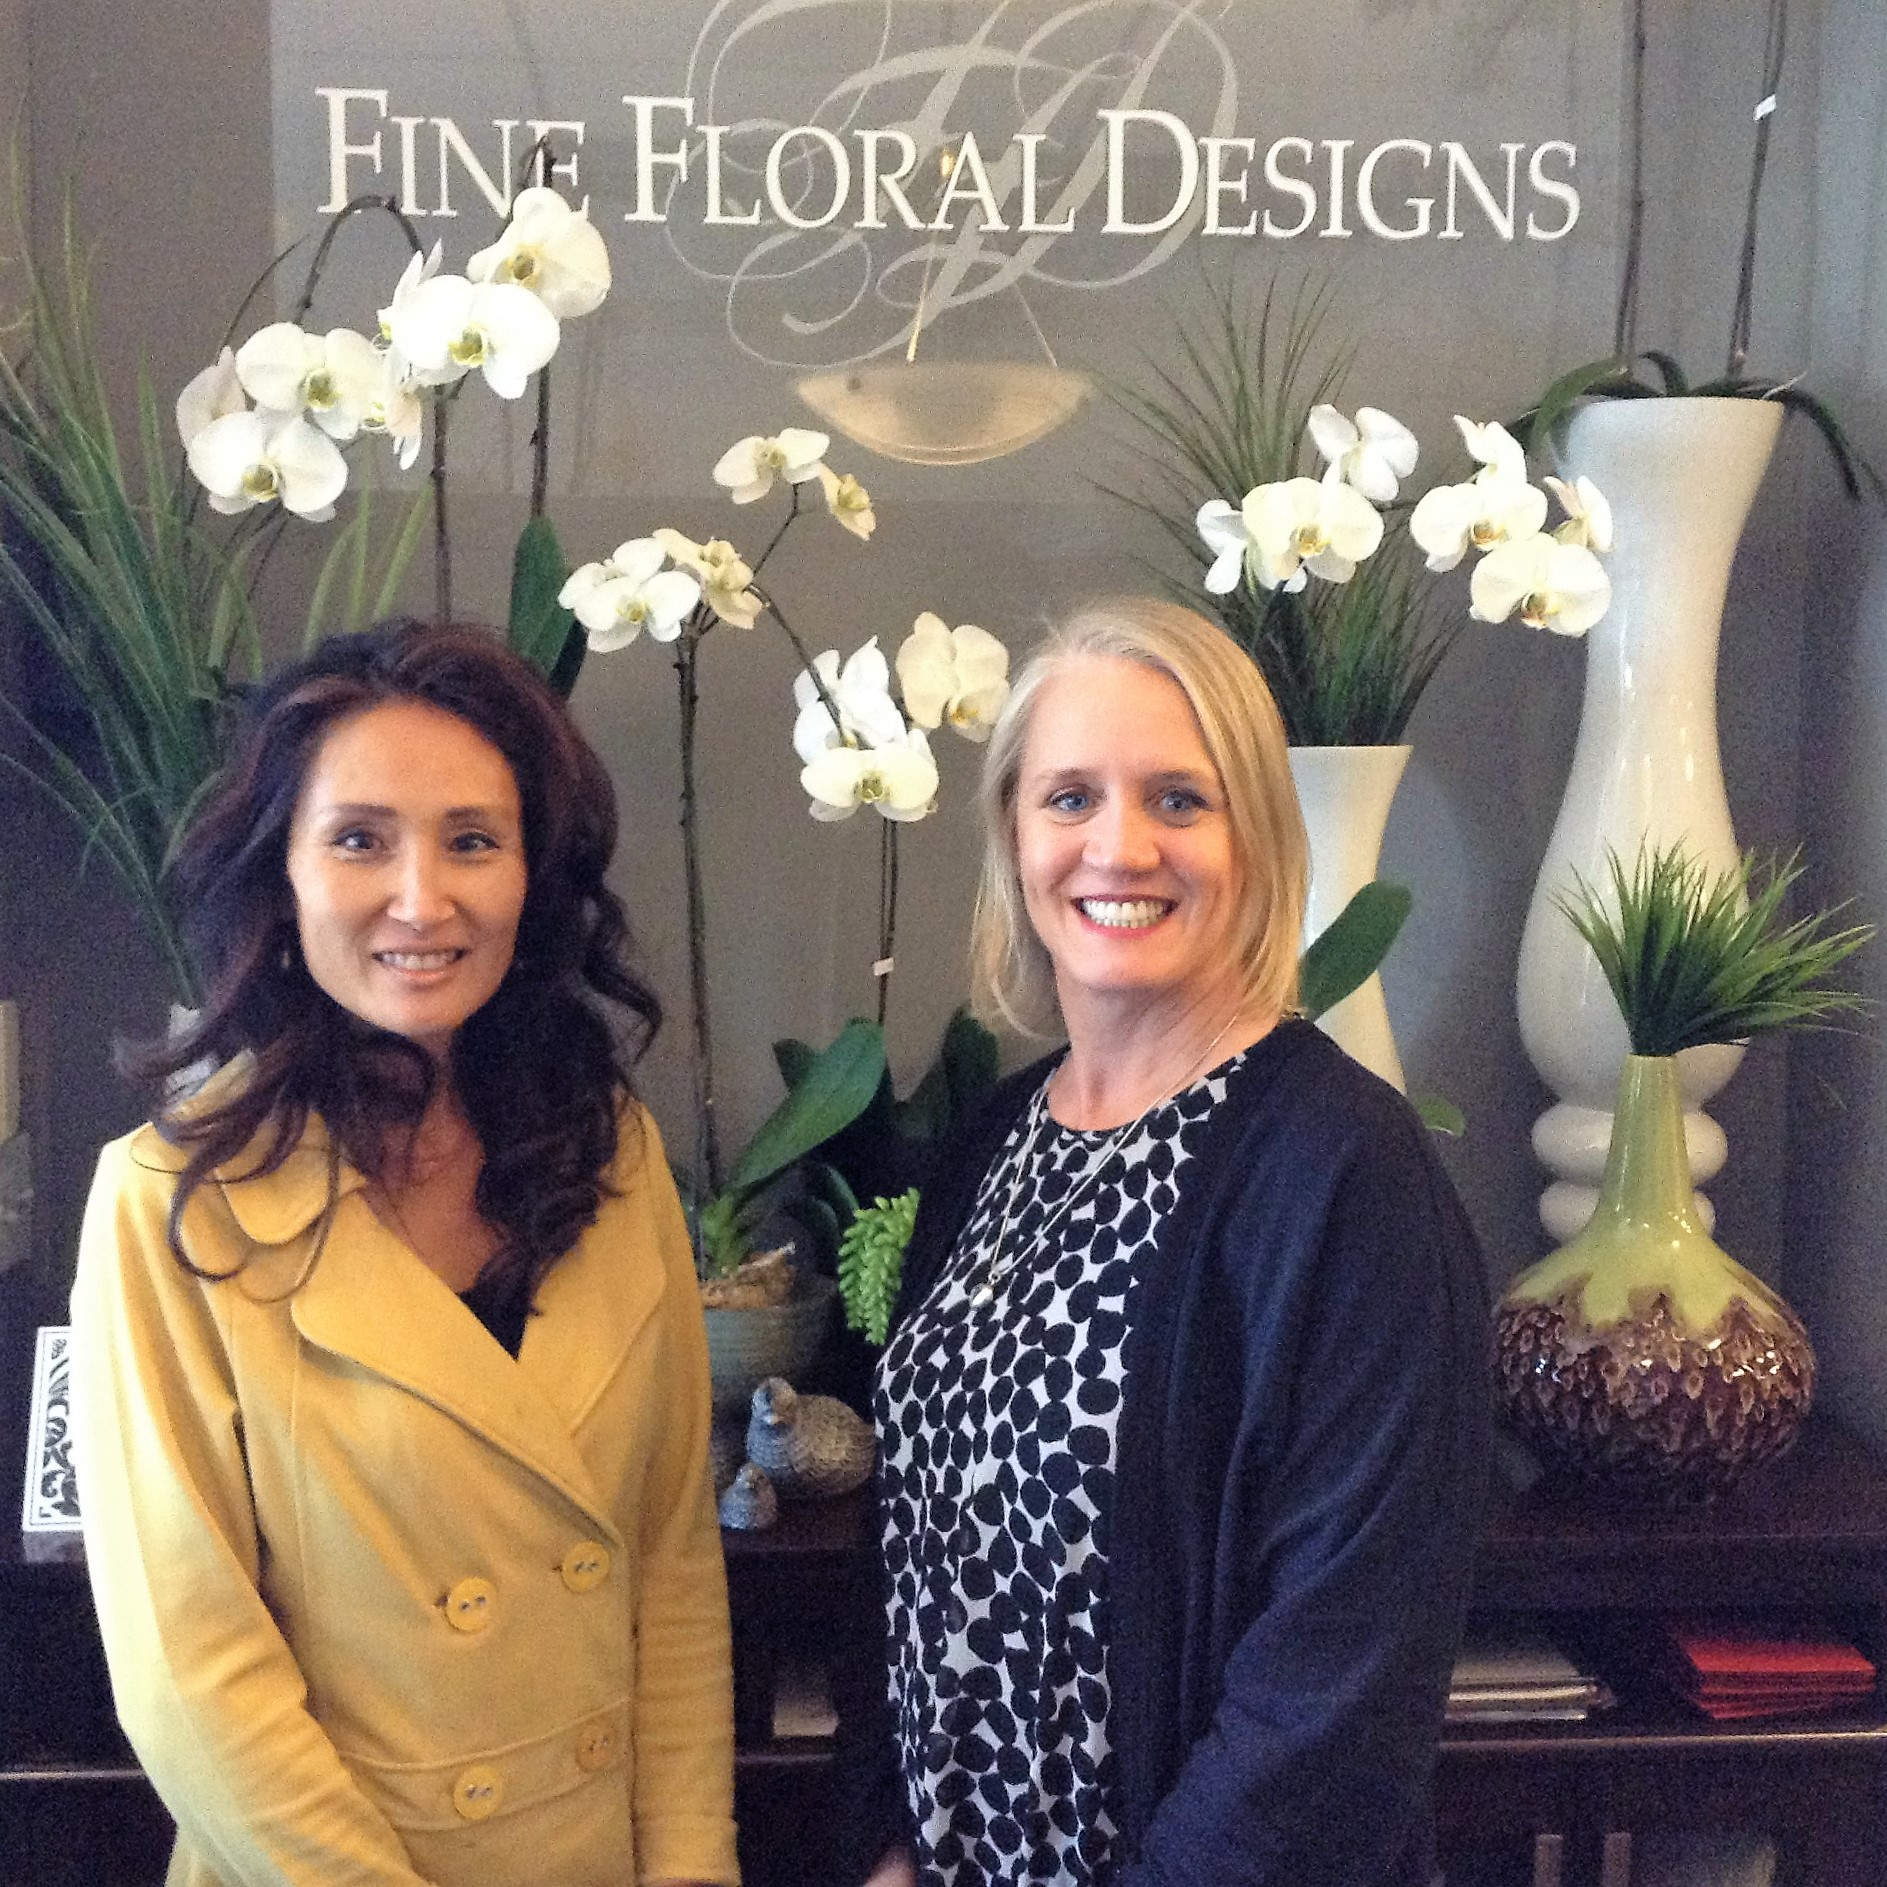 Fine Floral Designs in James Bay. Meet the Owner/Operator Jane Brajkovic!